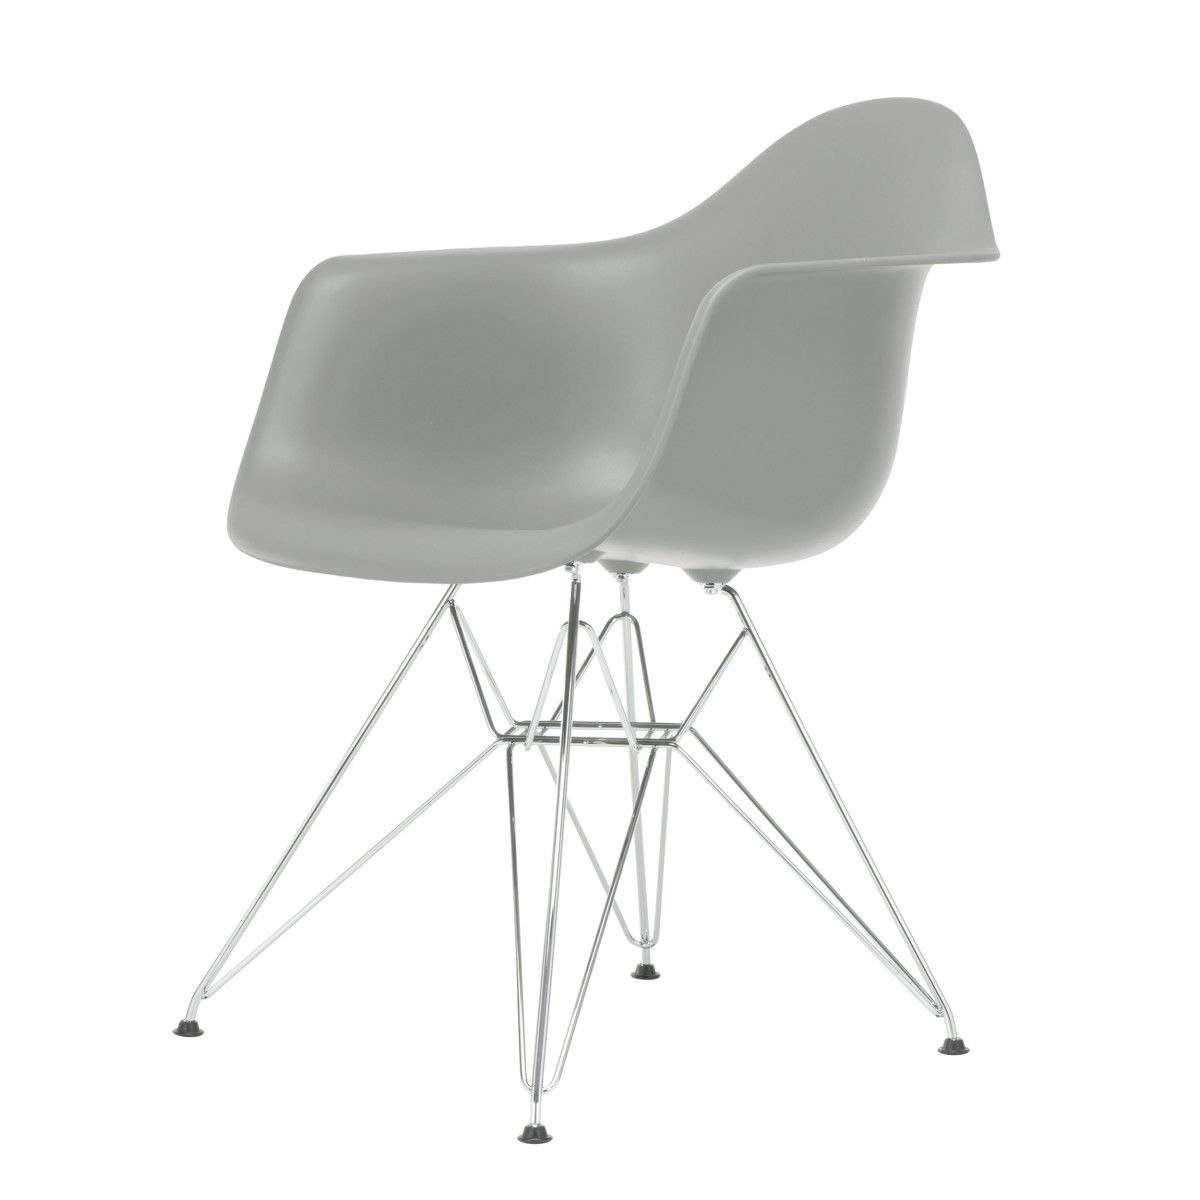 Eames Plastic Armchair Stuhl Dar Mit Filzgleitern Mauve Grau Neue Ma Szlige Jetzt Bestellen Unter Https Moebel Ladendirek Eames Stuhle Vitra Stuhl